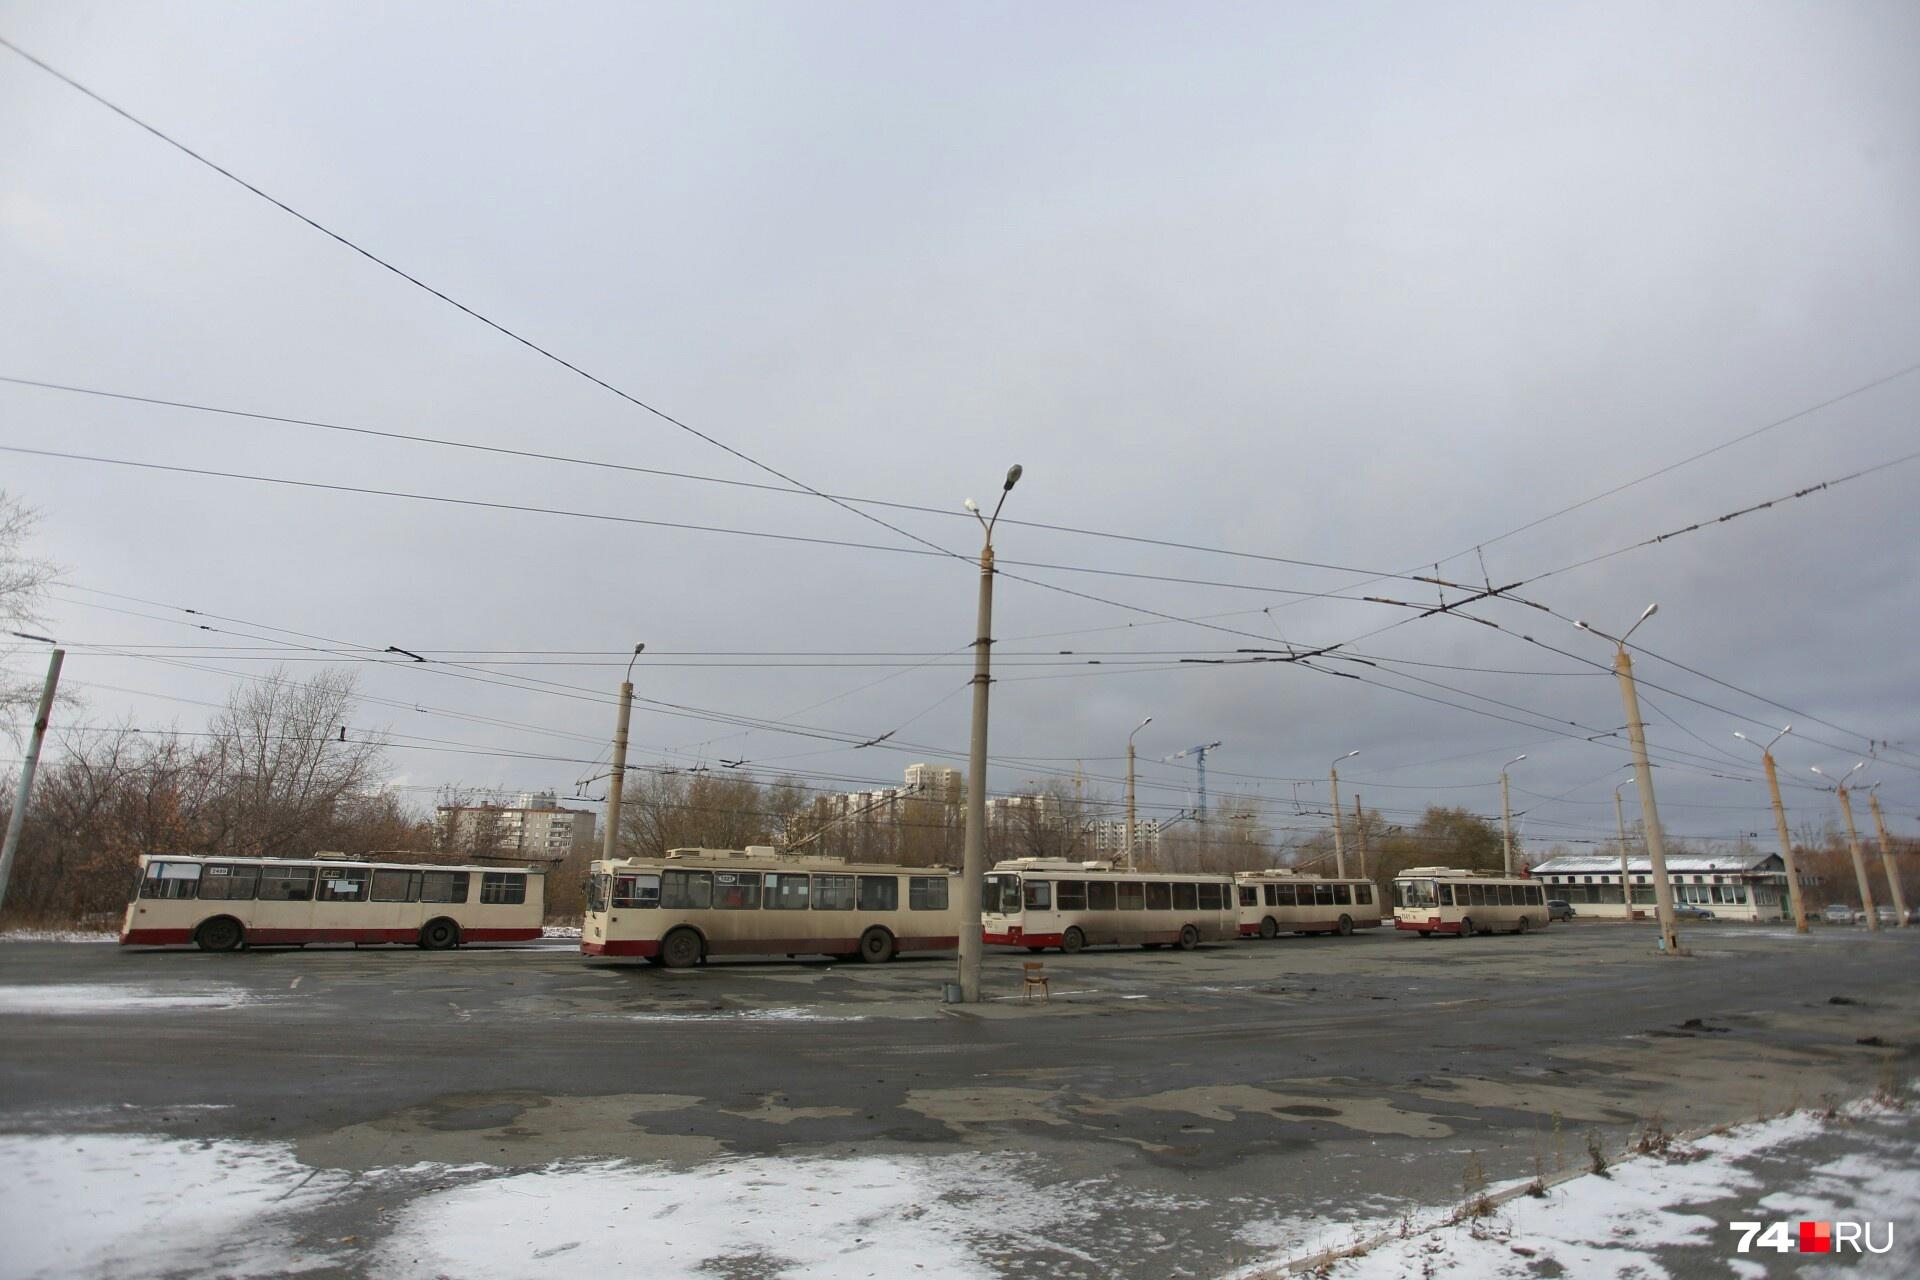 Территория будущего аквапарка находится за троллейбусным кольцом на АМЗ